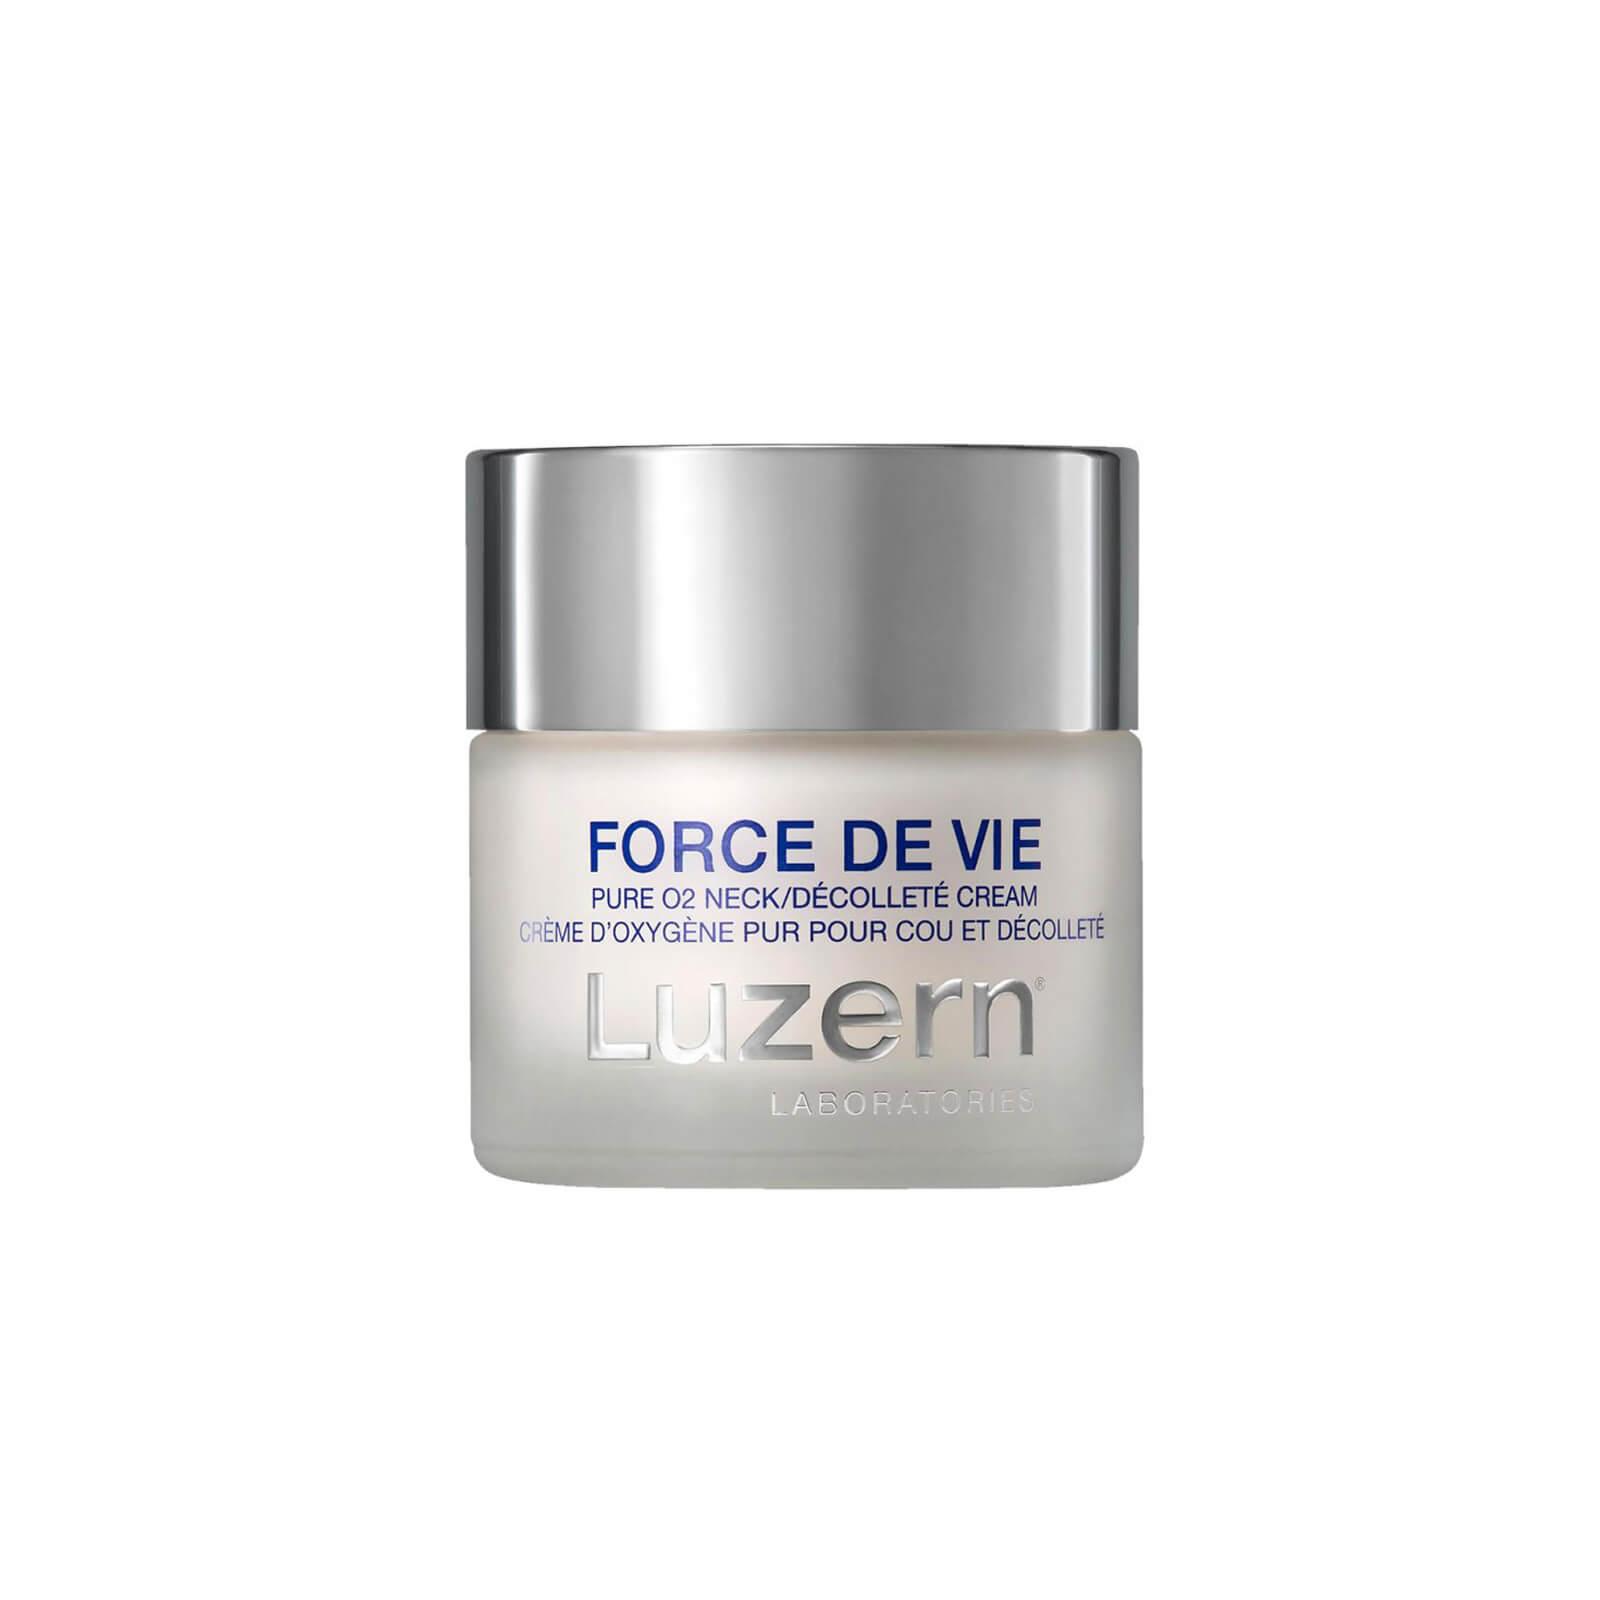 Luzern Force De Vie Pure O2 Neck/Decollete Cream 60ml